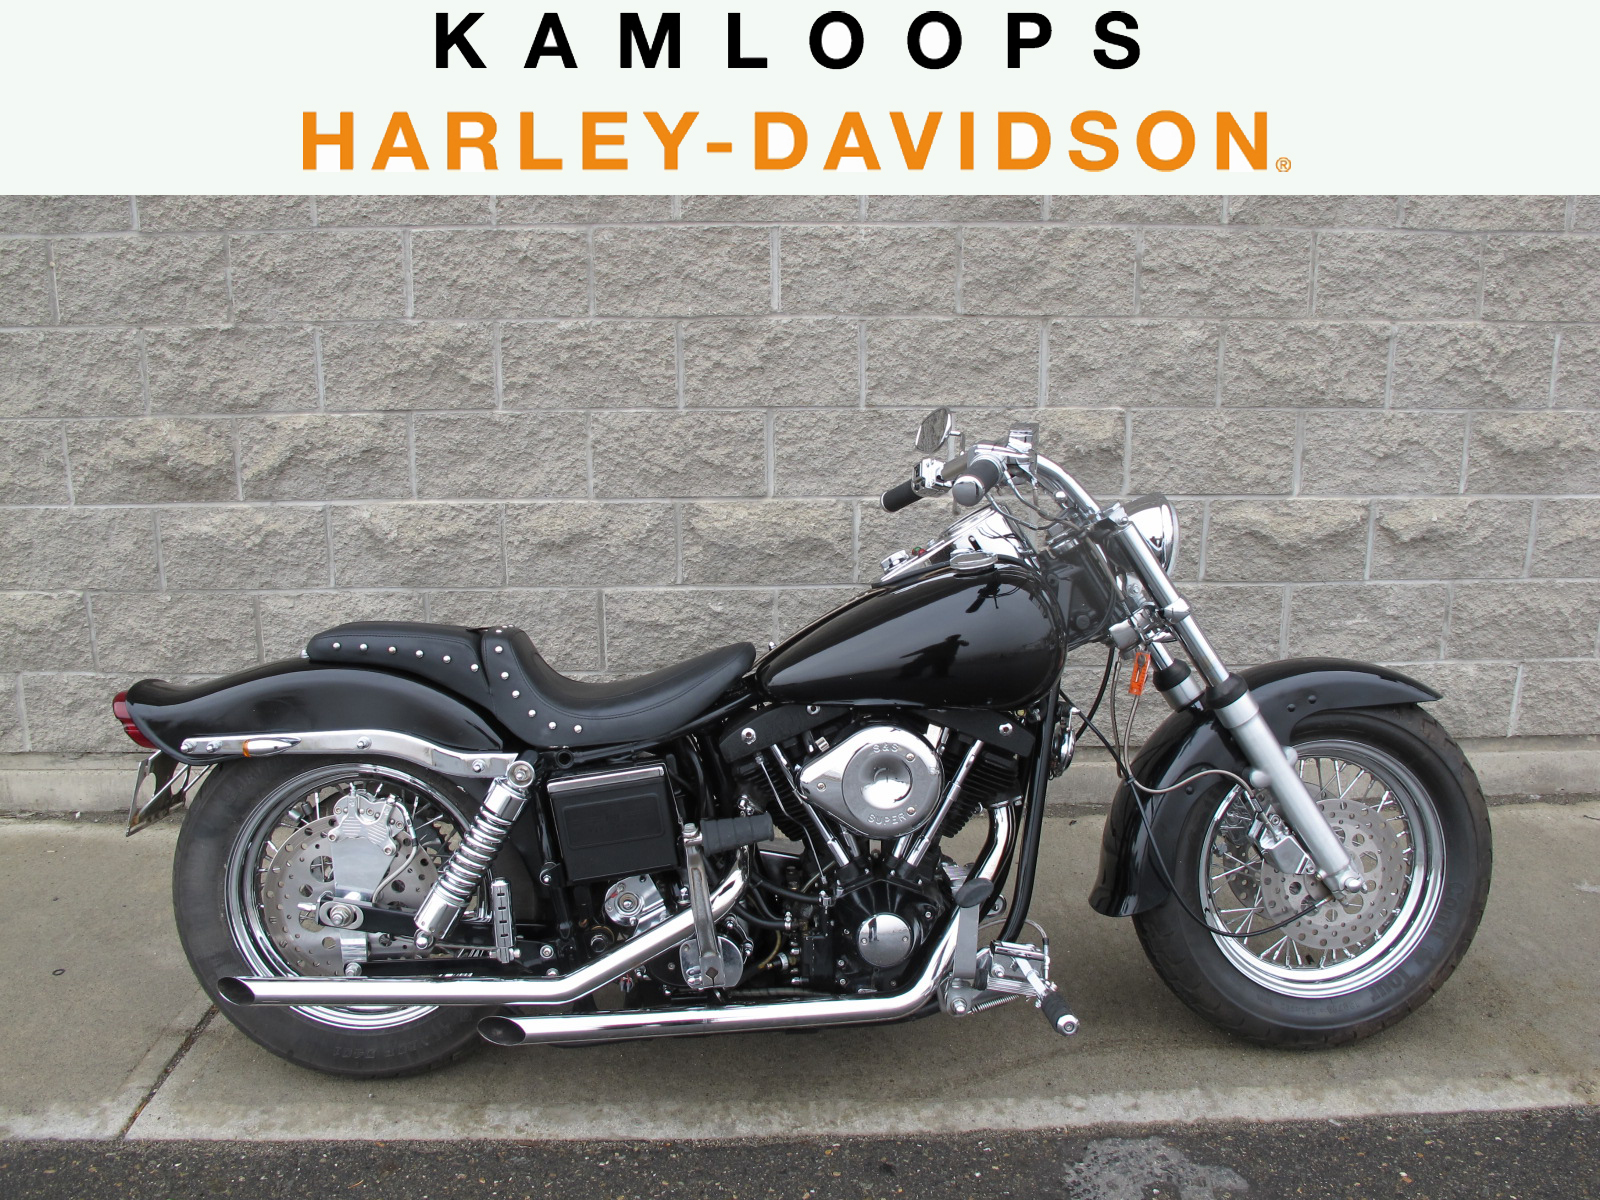 FOR SALE 1981 Harley Davidson FXS Low Rider SOLD